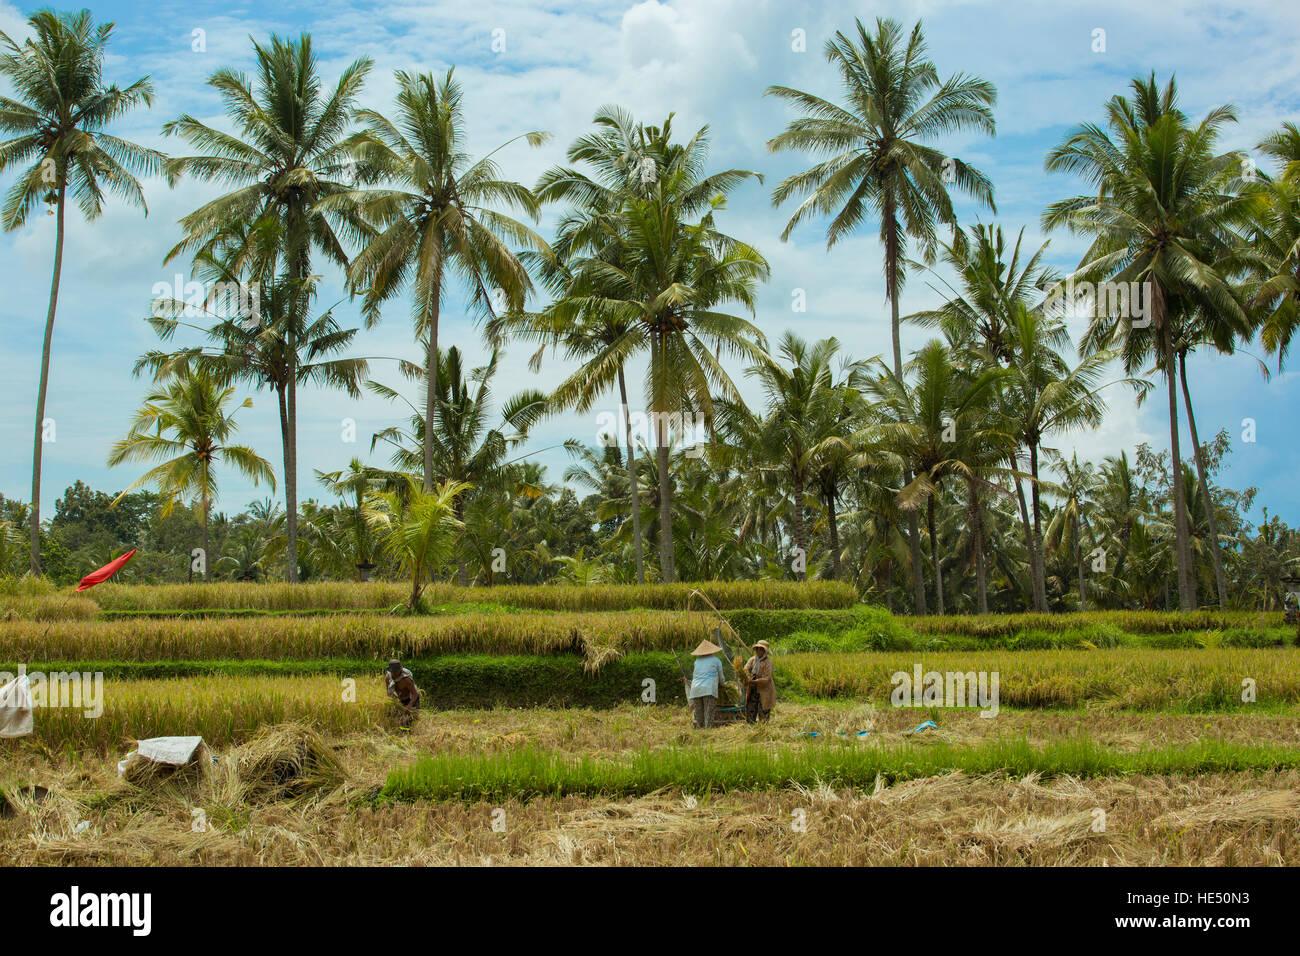 harvest in Tegallalang,ubud Bali - Stock Image